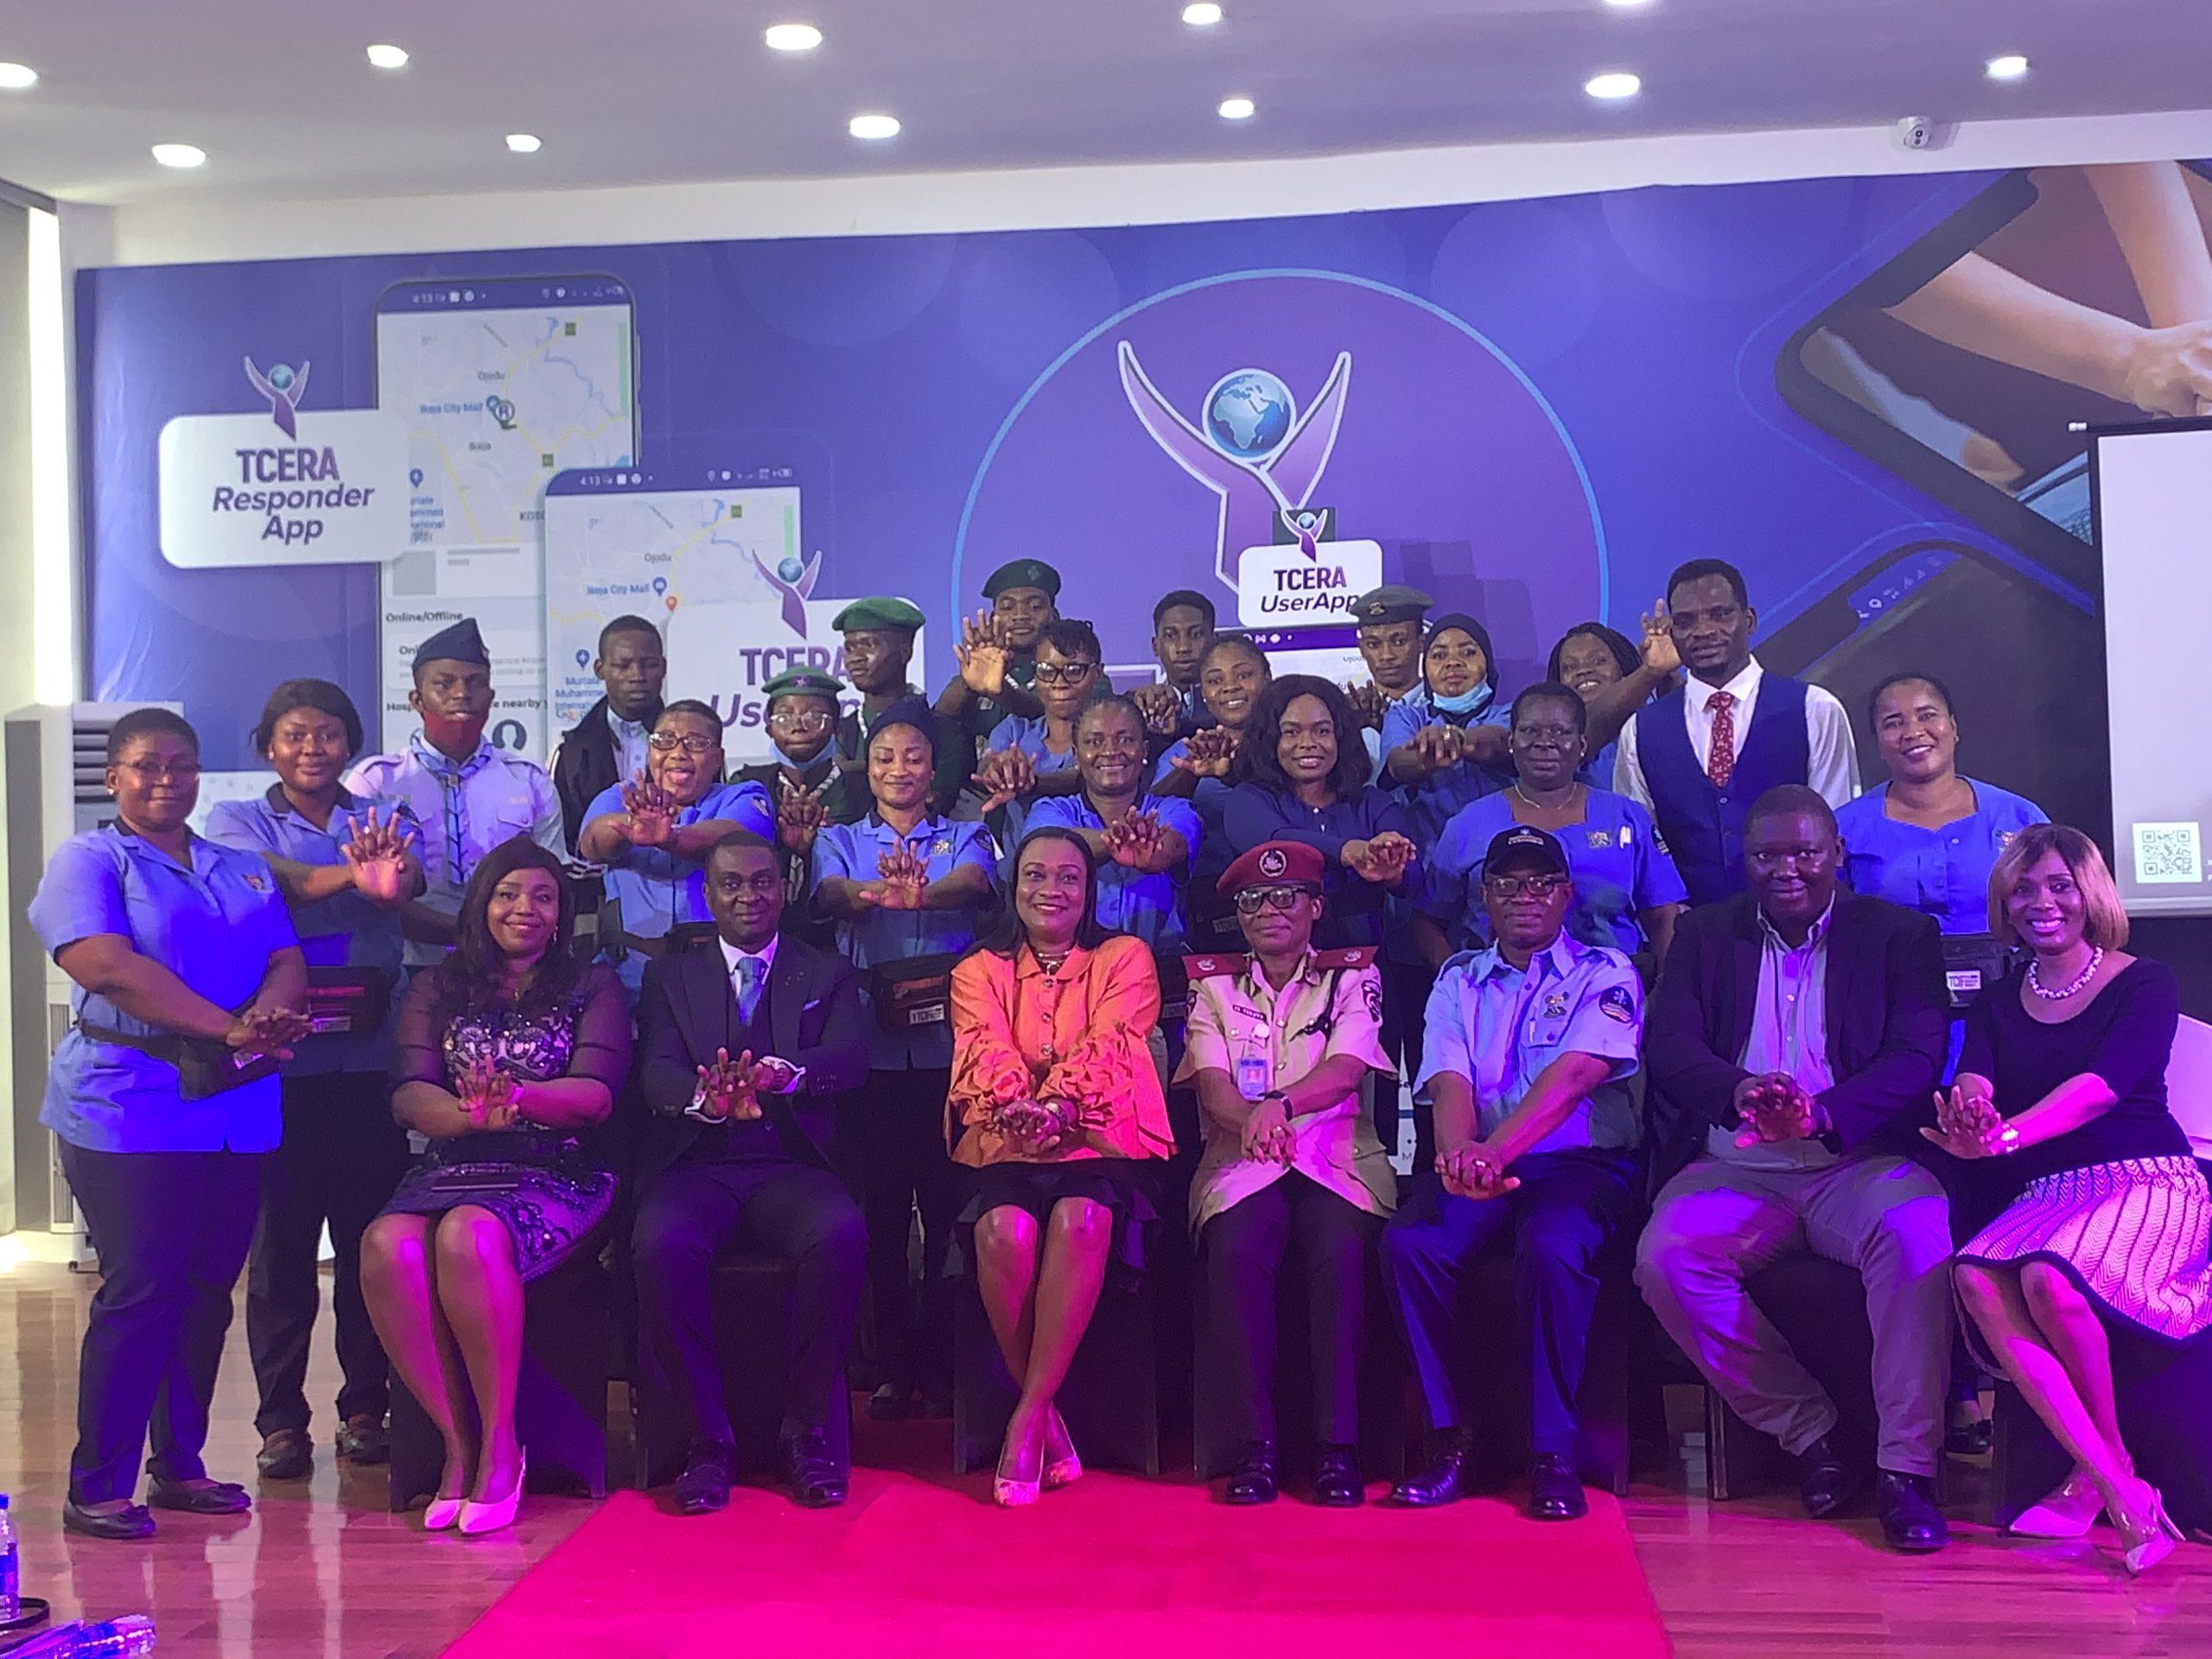 Trauma Care International Foundation(TCIF) launches the Trauma Care Emergency Response Application, TCERA at at BON Hotel Ikeja Residence, Lagos